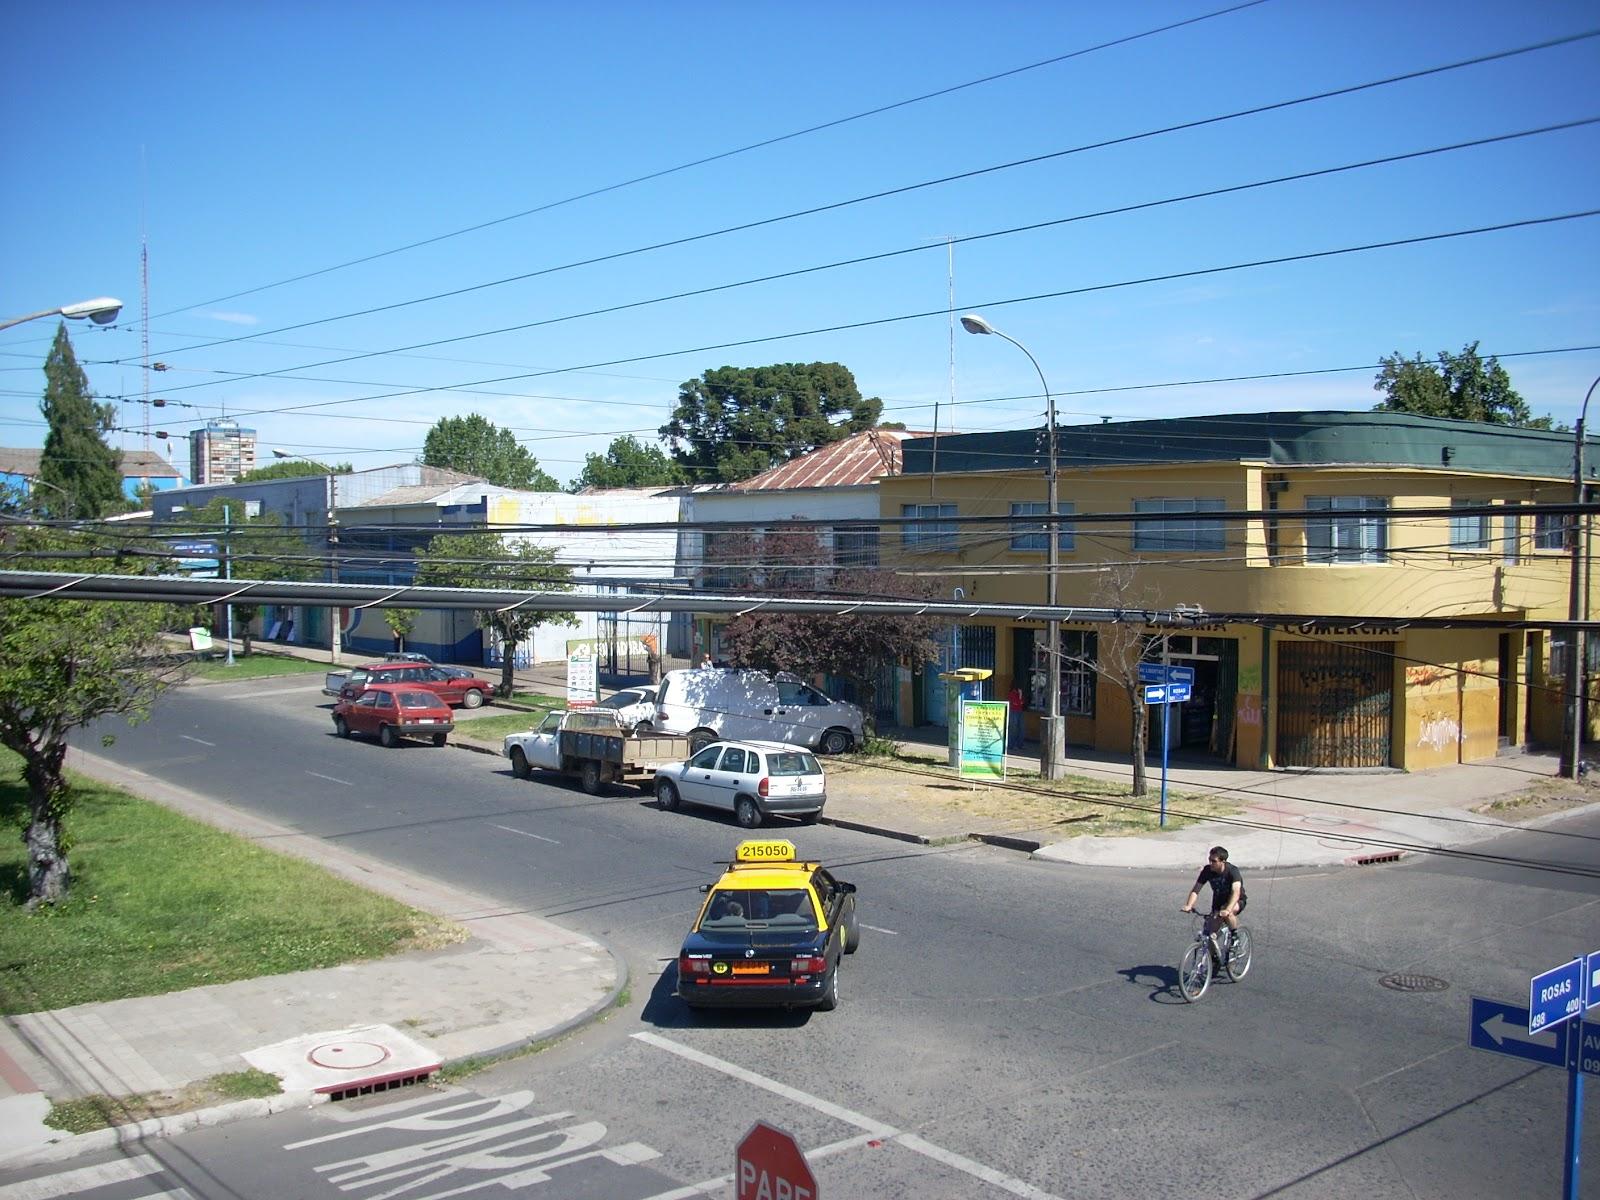 Random street view out my hotel window in Chillan